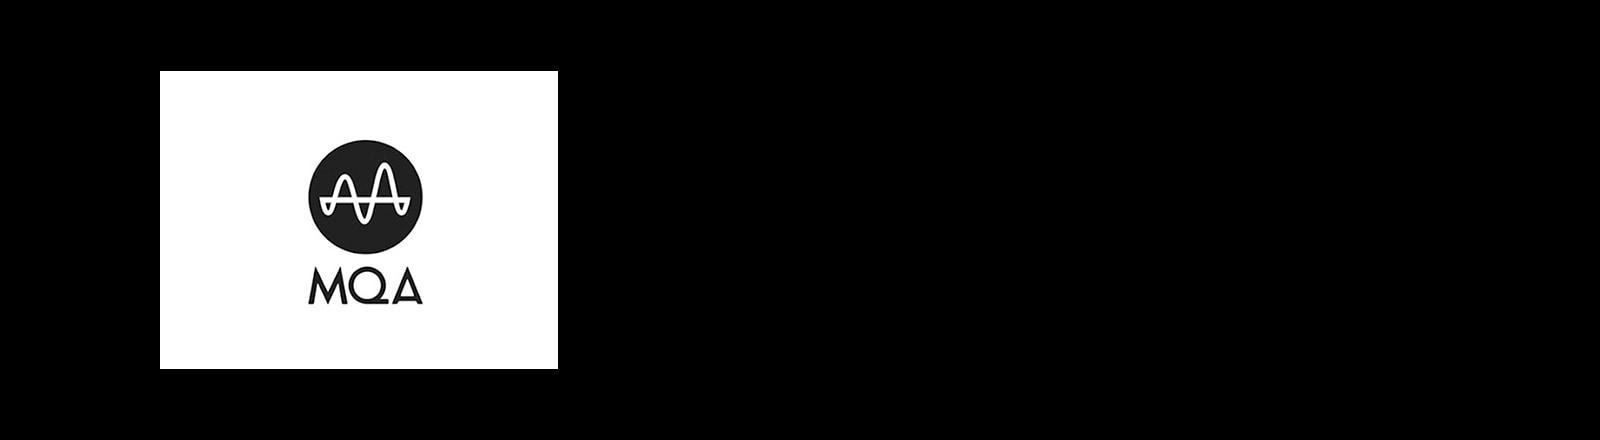 "Imágen de logo ""MQA"""